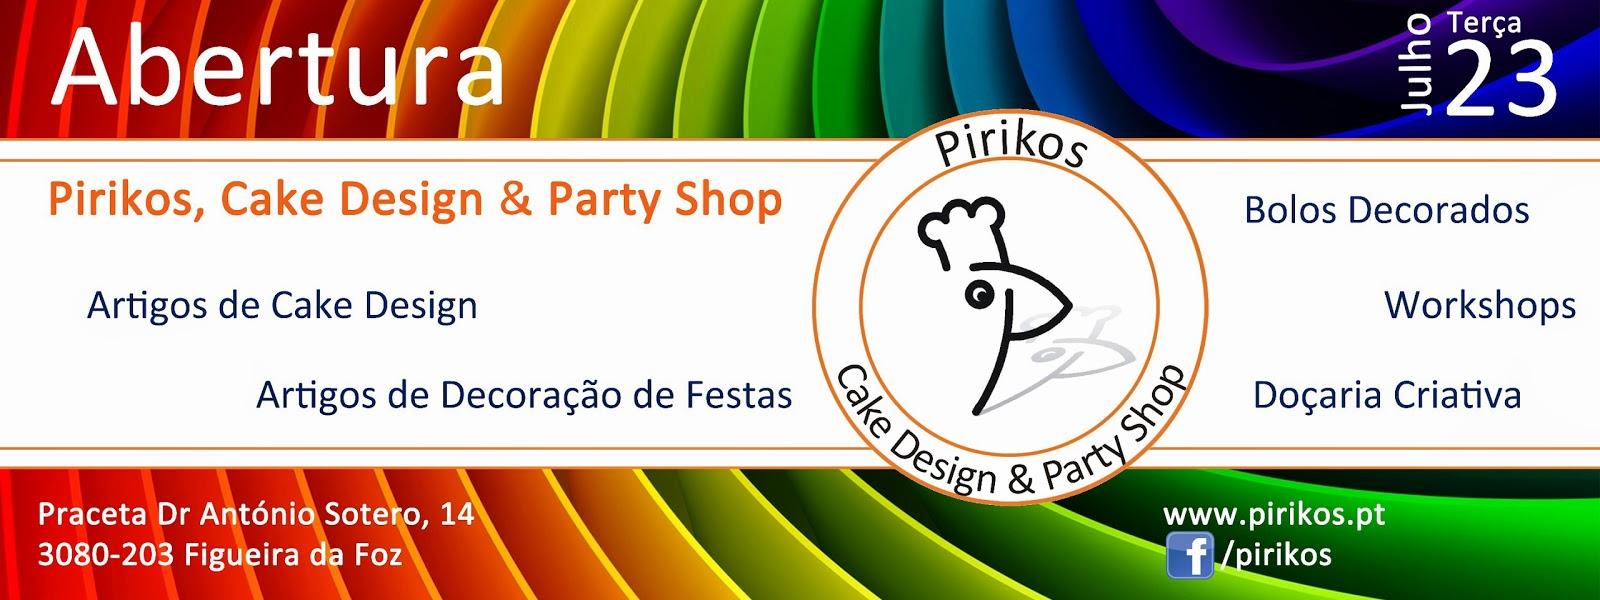 ae046e2169 Pirikos Cake Design  Pirikos